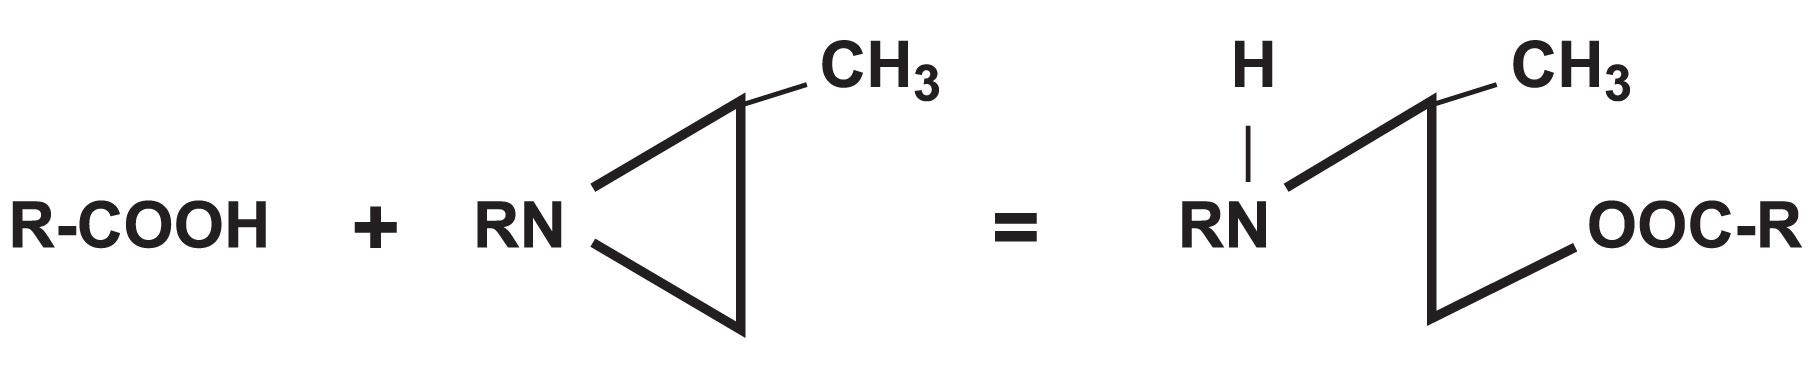 PolyAziridine Reaction Mechanism